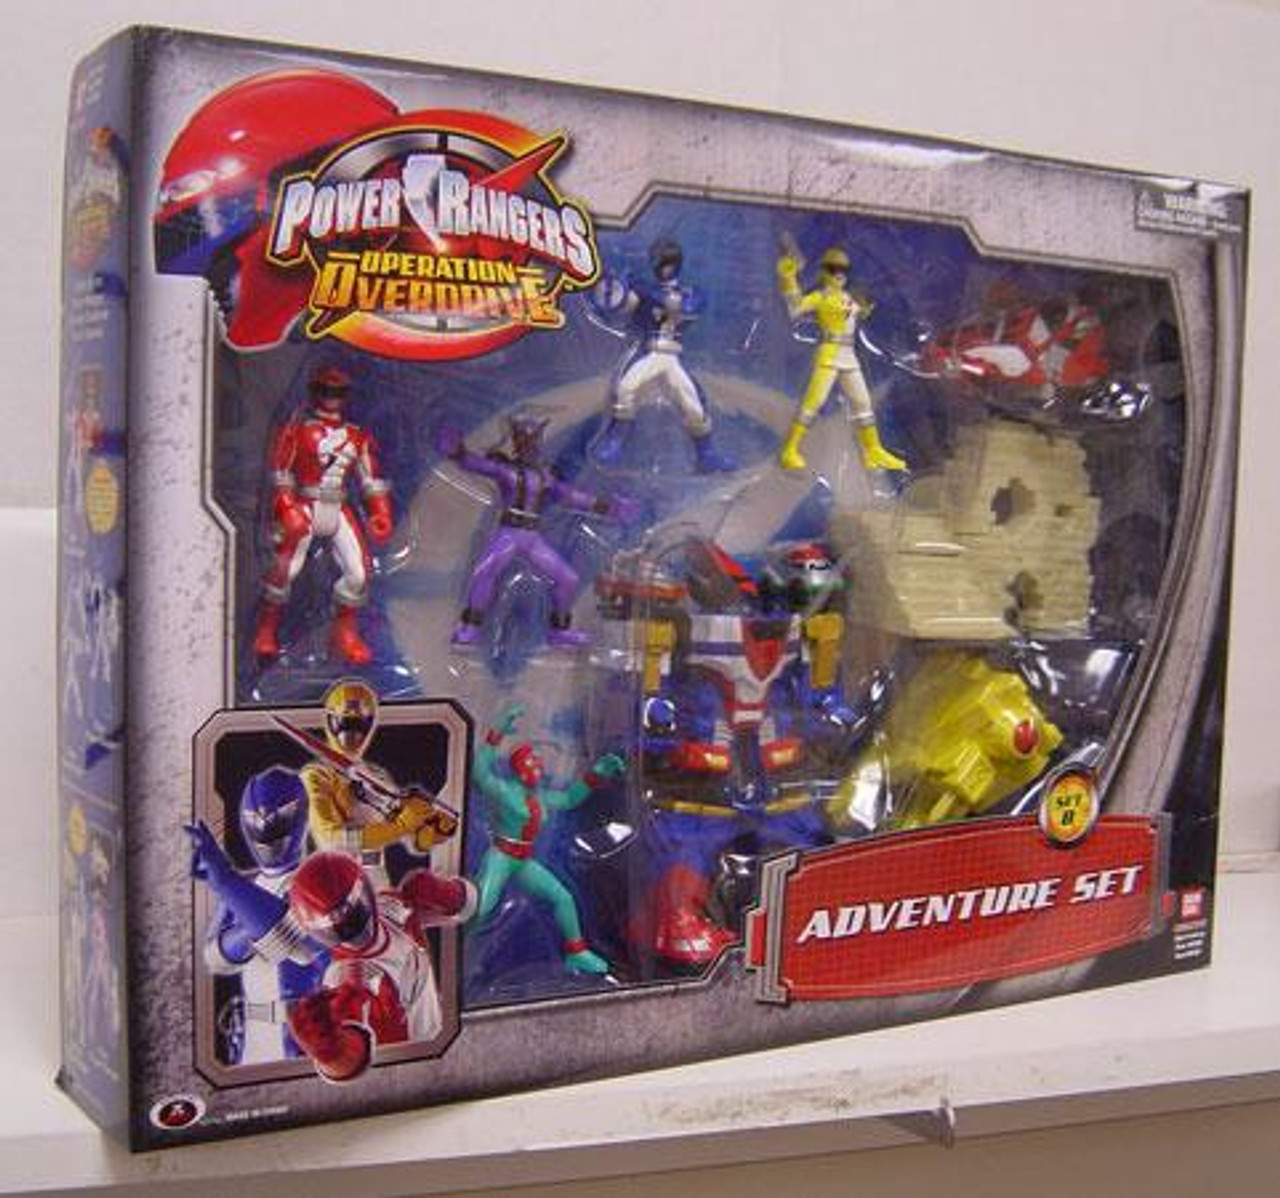 Operation Overdrive Power Rangers Adventure Set PVC Figures [Set B]